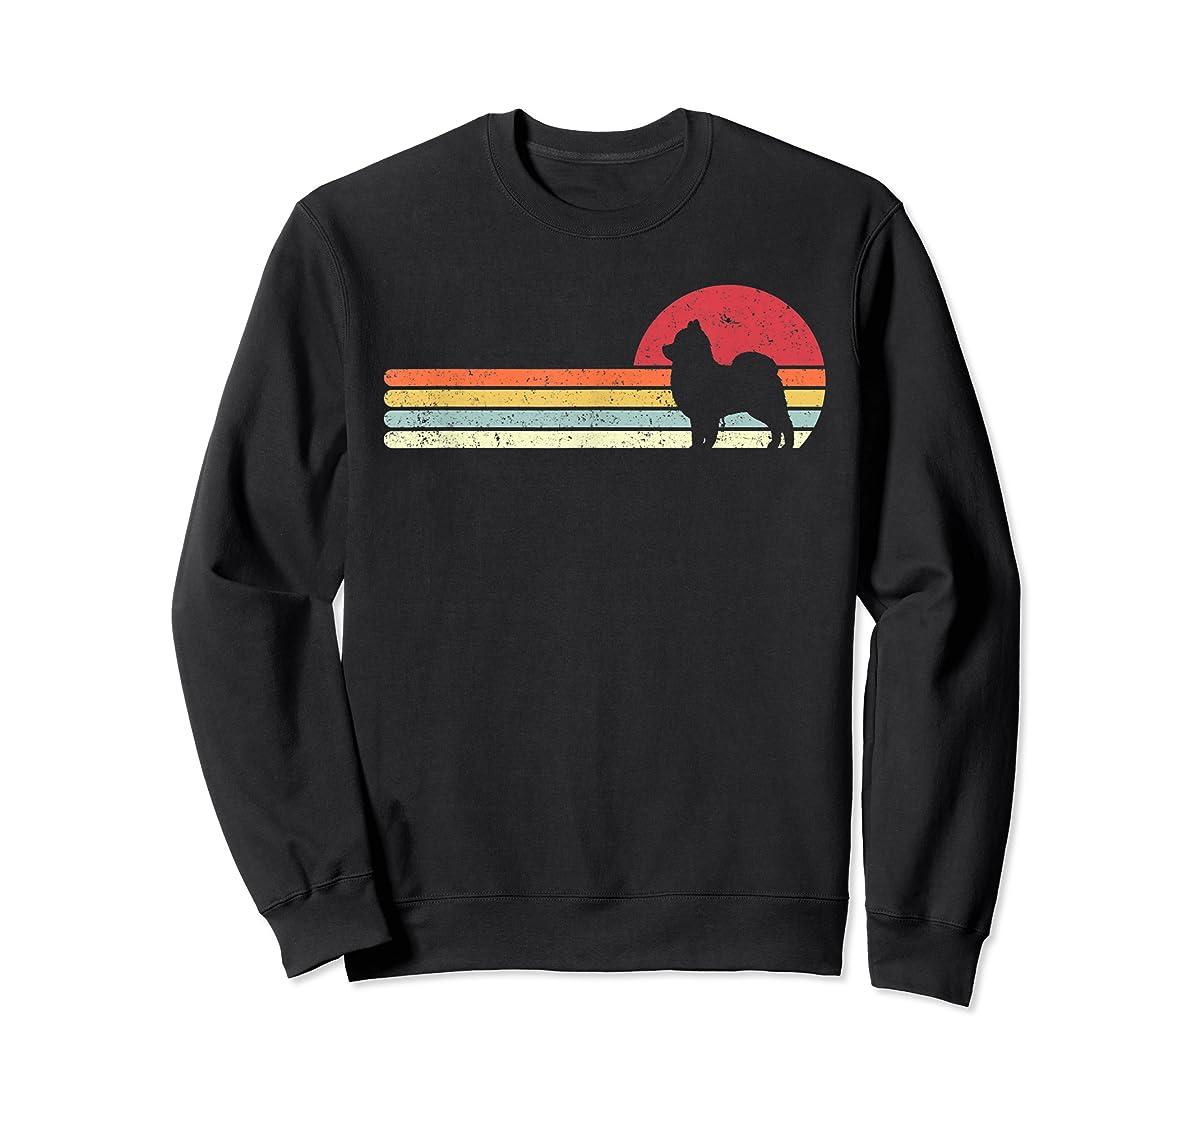 Pomeranian Shirt. Retro Style T-Shirt-Sweatshirt-Black